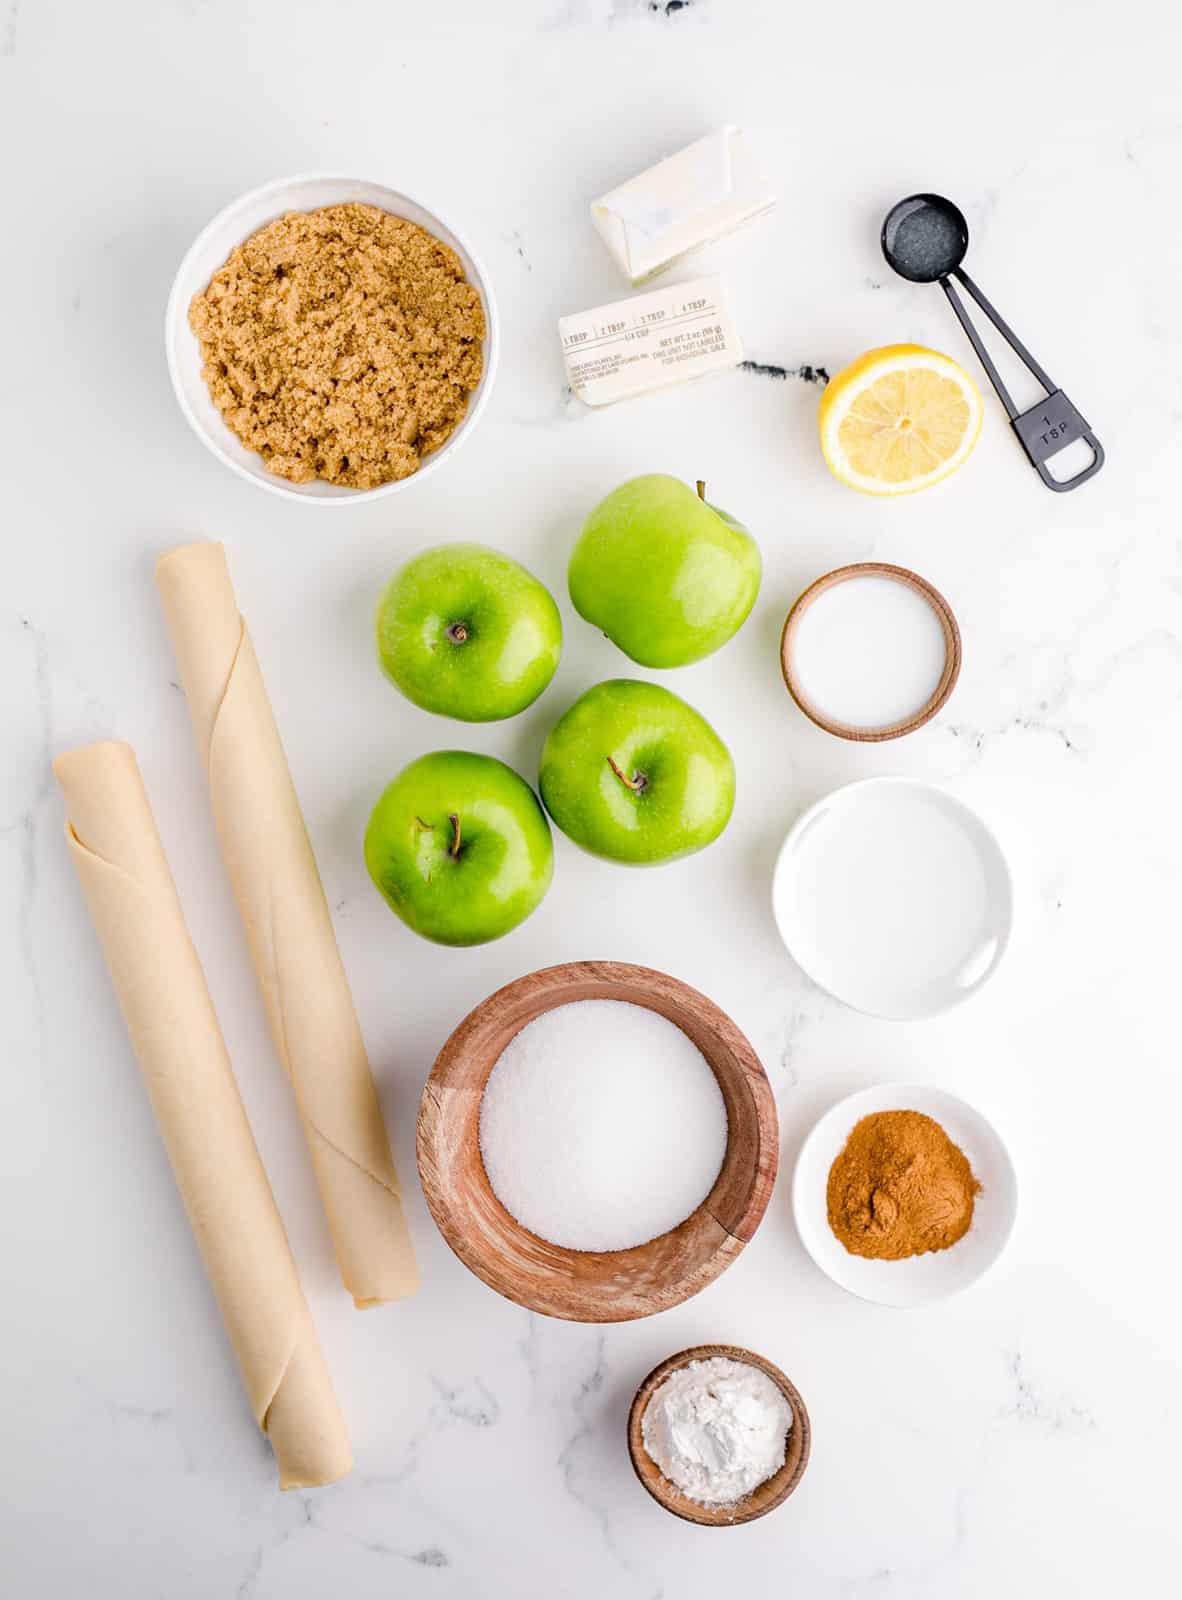 Ingredients needed to make Apple Pie.